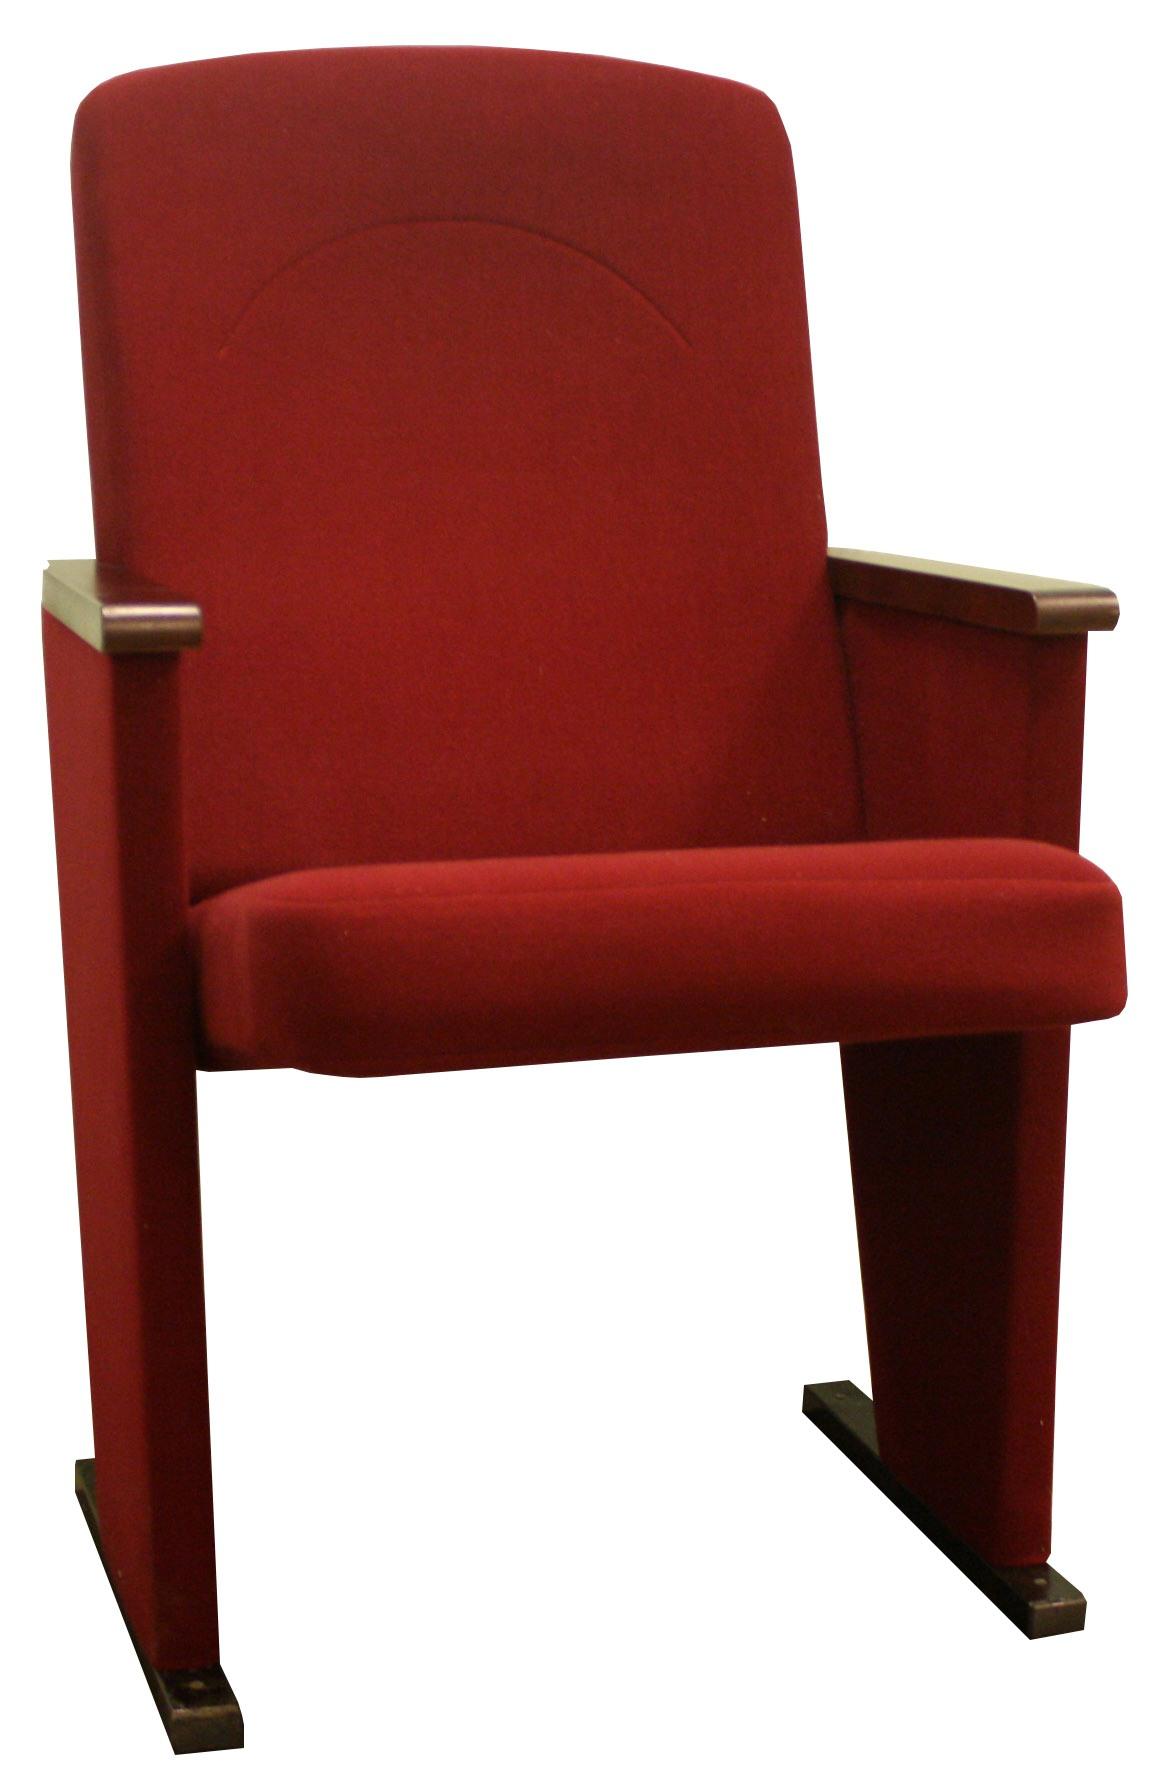 кресла кд-113у